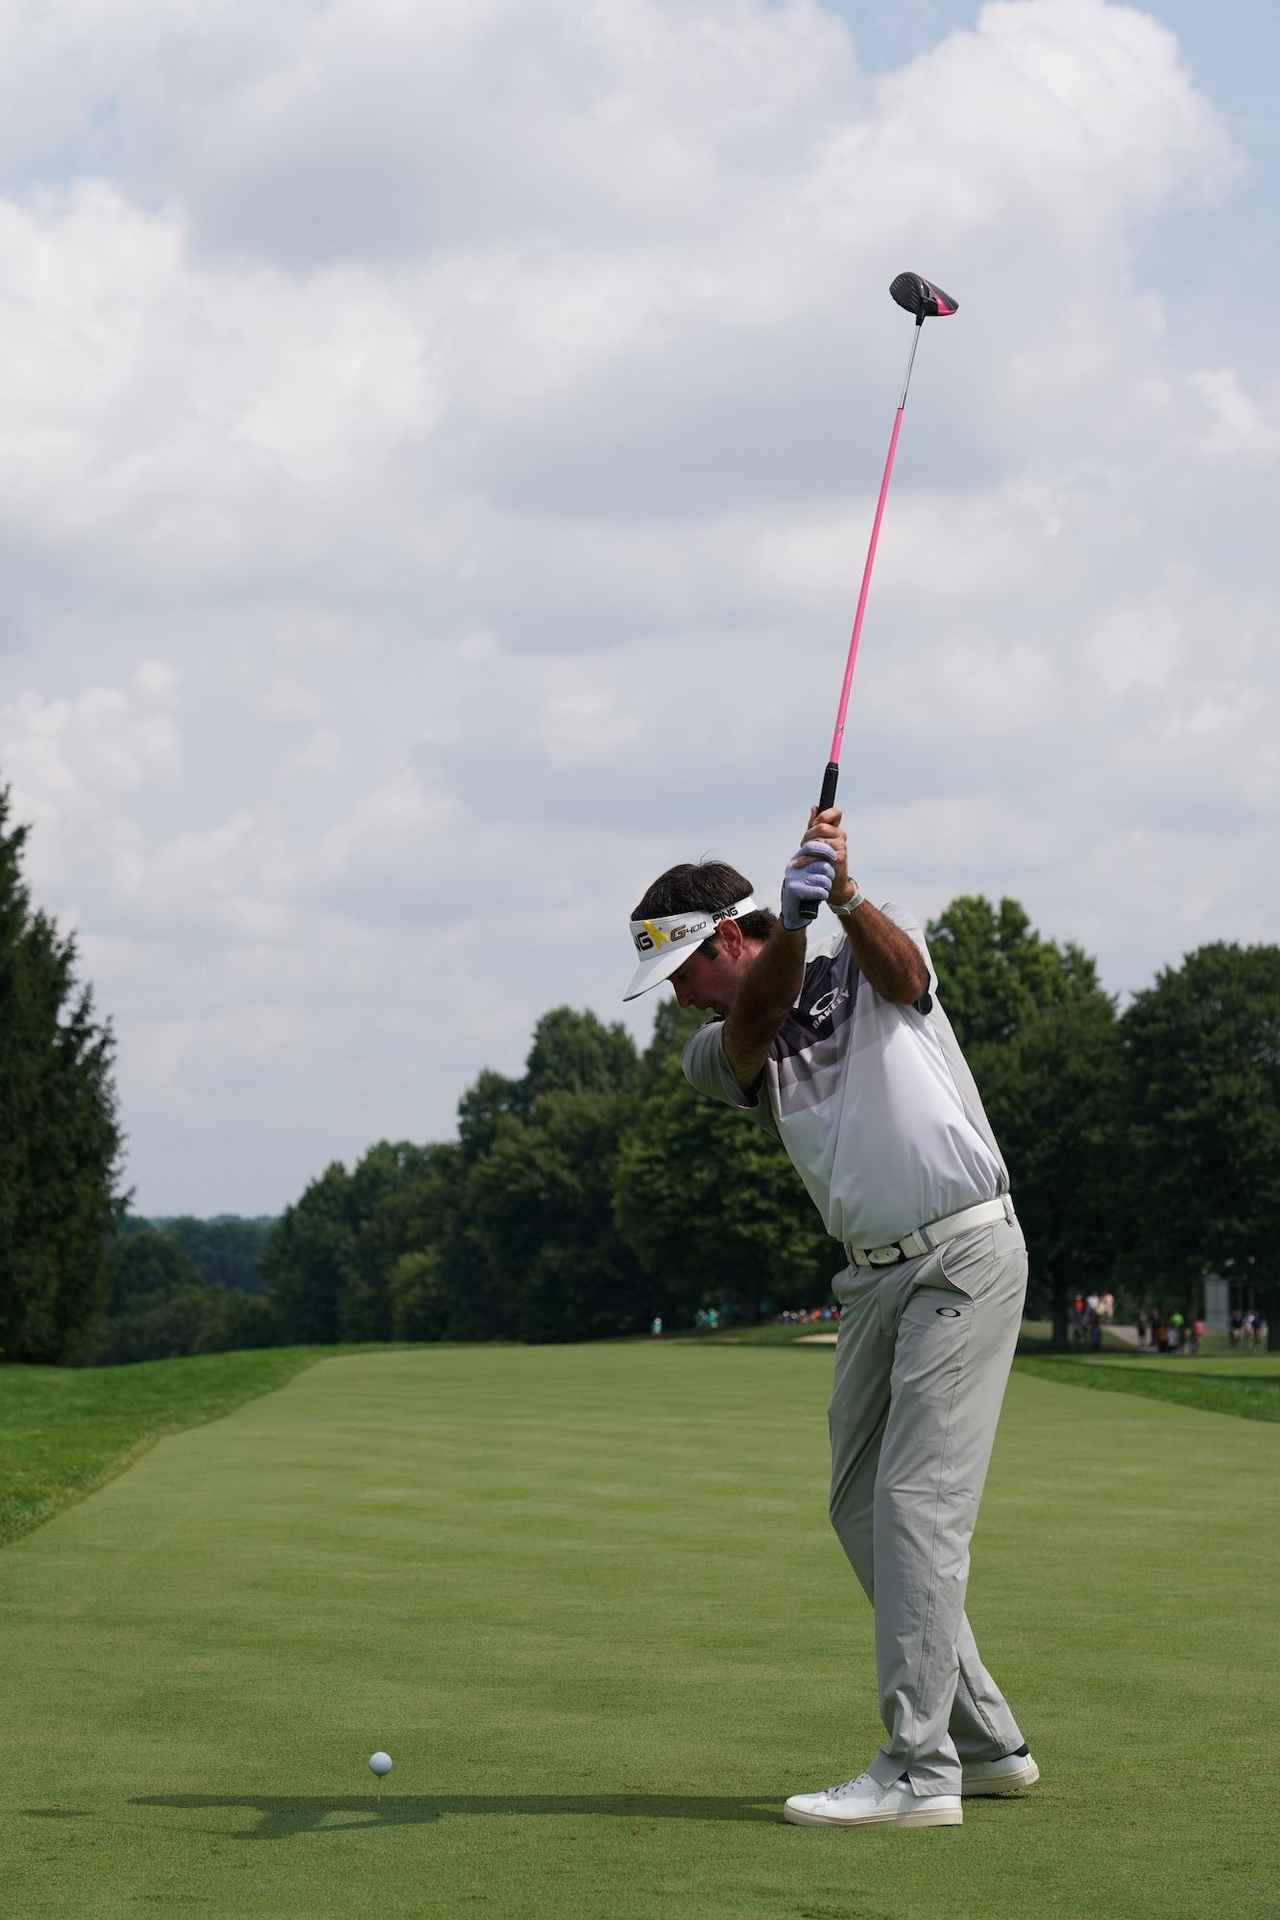 Images : 6番目の画像 - 強烈! バッバ・ワトソンのドライバーショット - みんなのゴルフダイジェスト